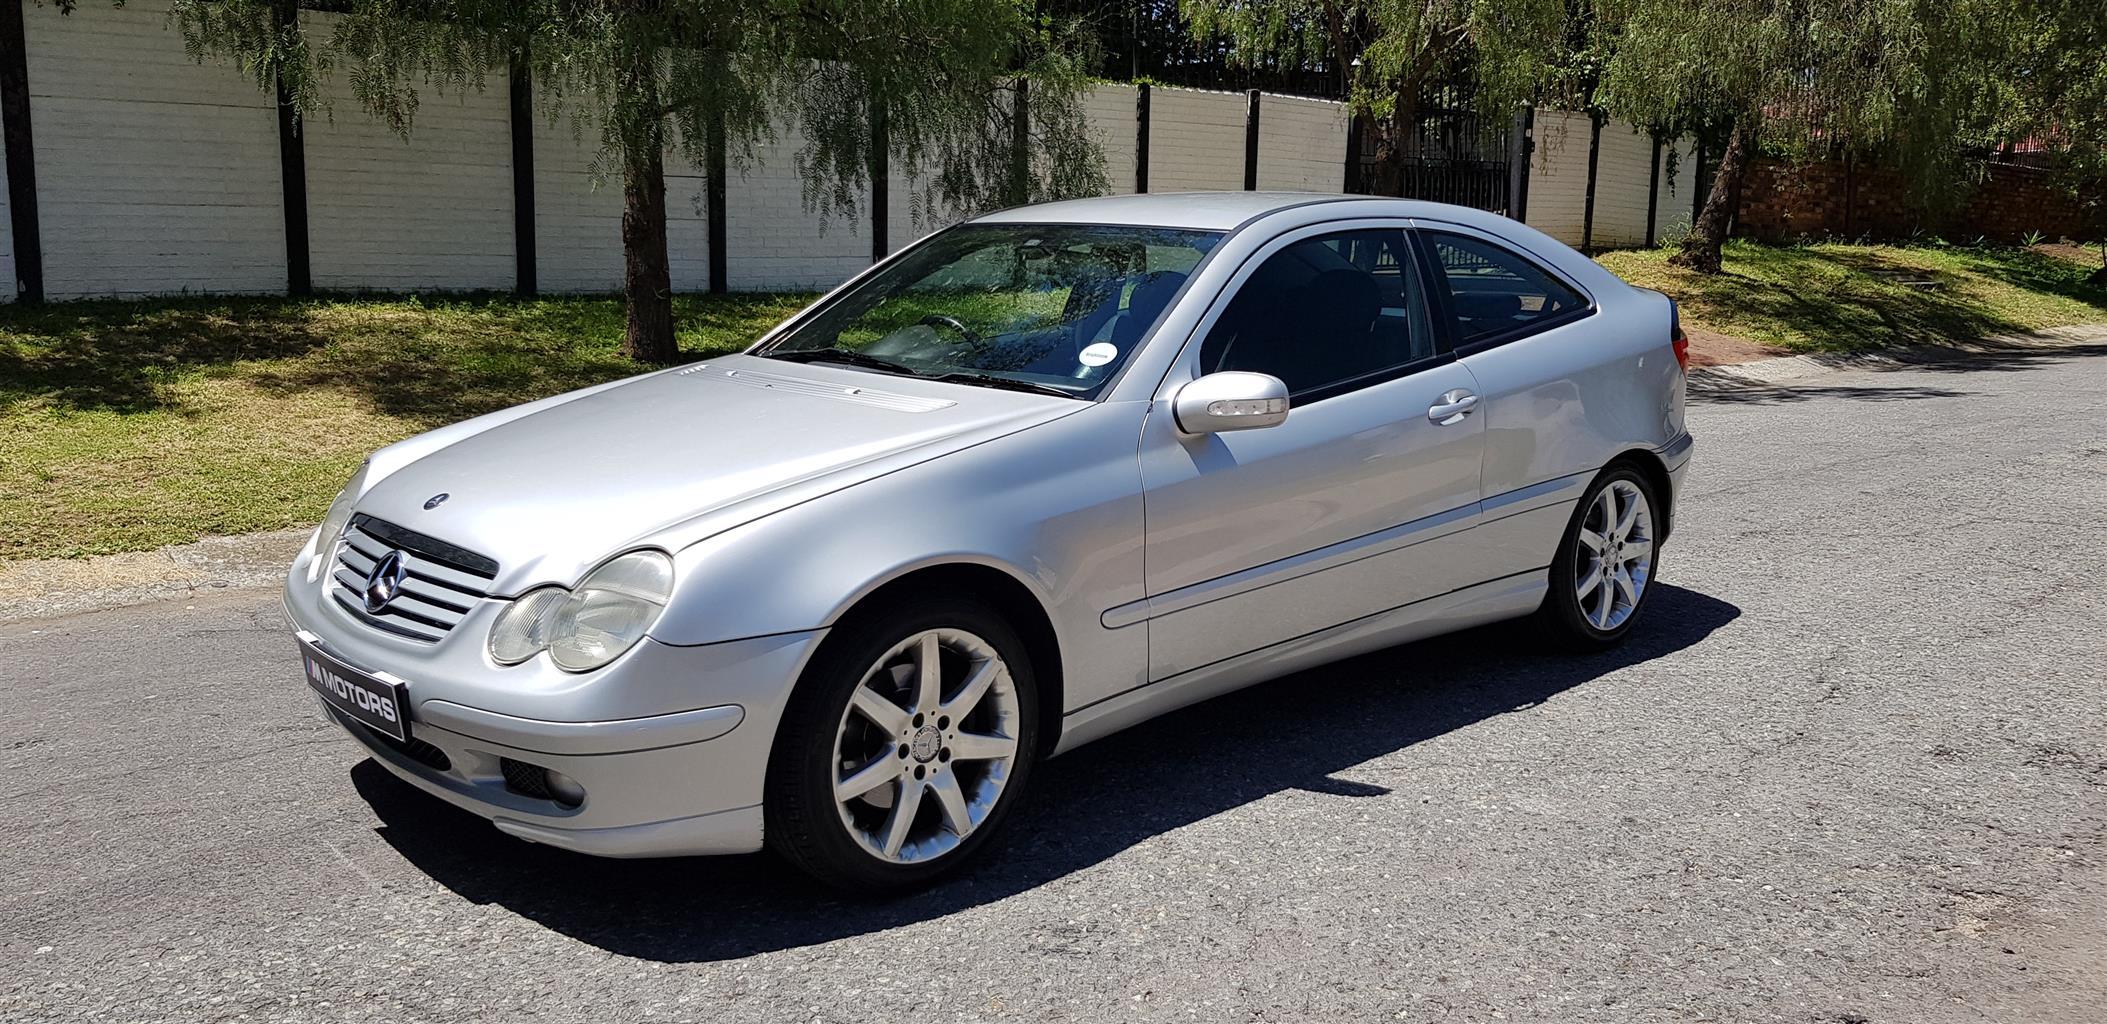 2002 Mercedes Benz C Class C230 Kompressor Sports Coupé Evolution | Junk  Mail